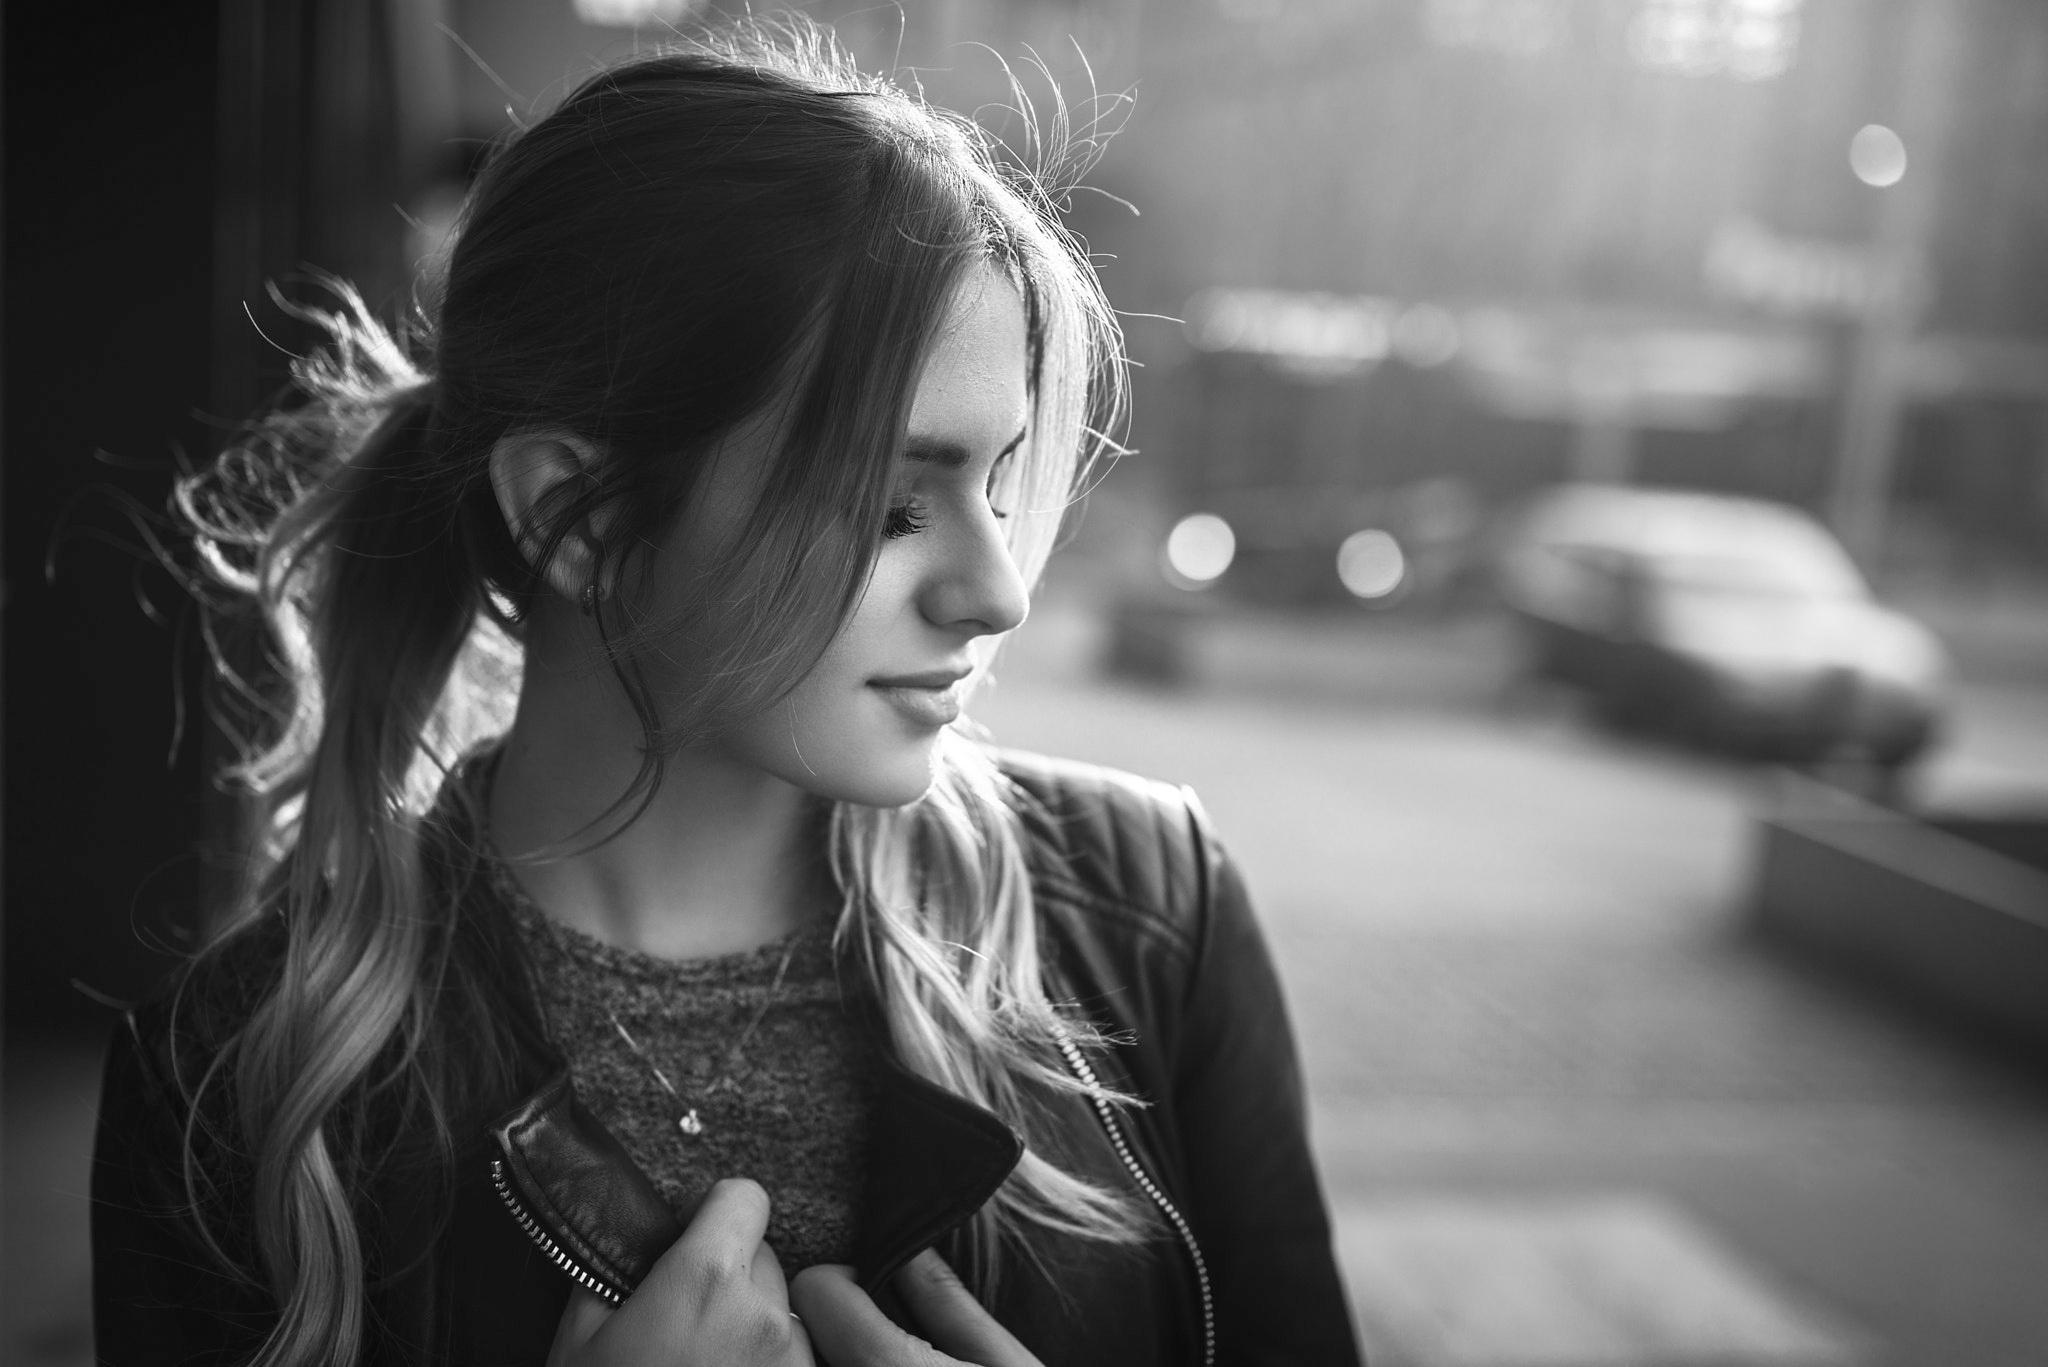 черно белая фотосессия на улице брюнетка бунтарским характером